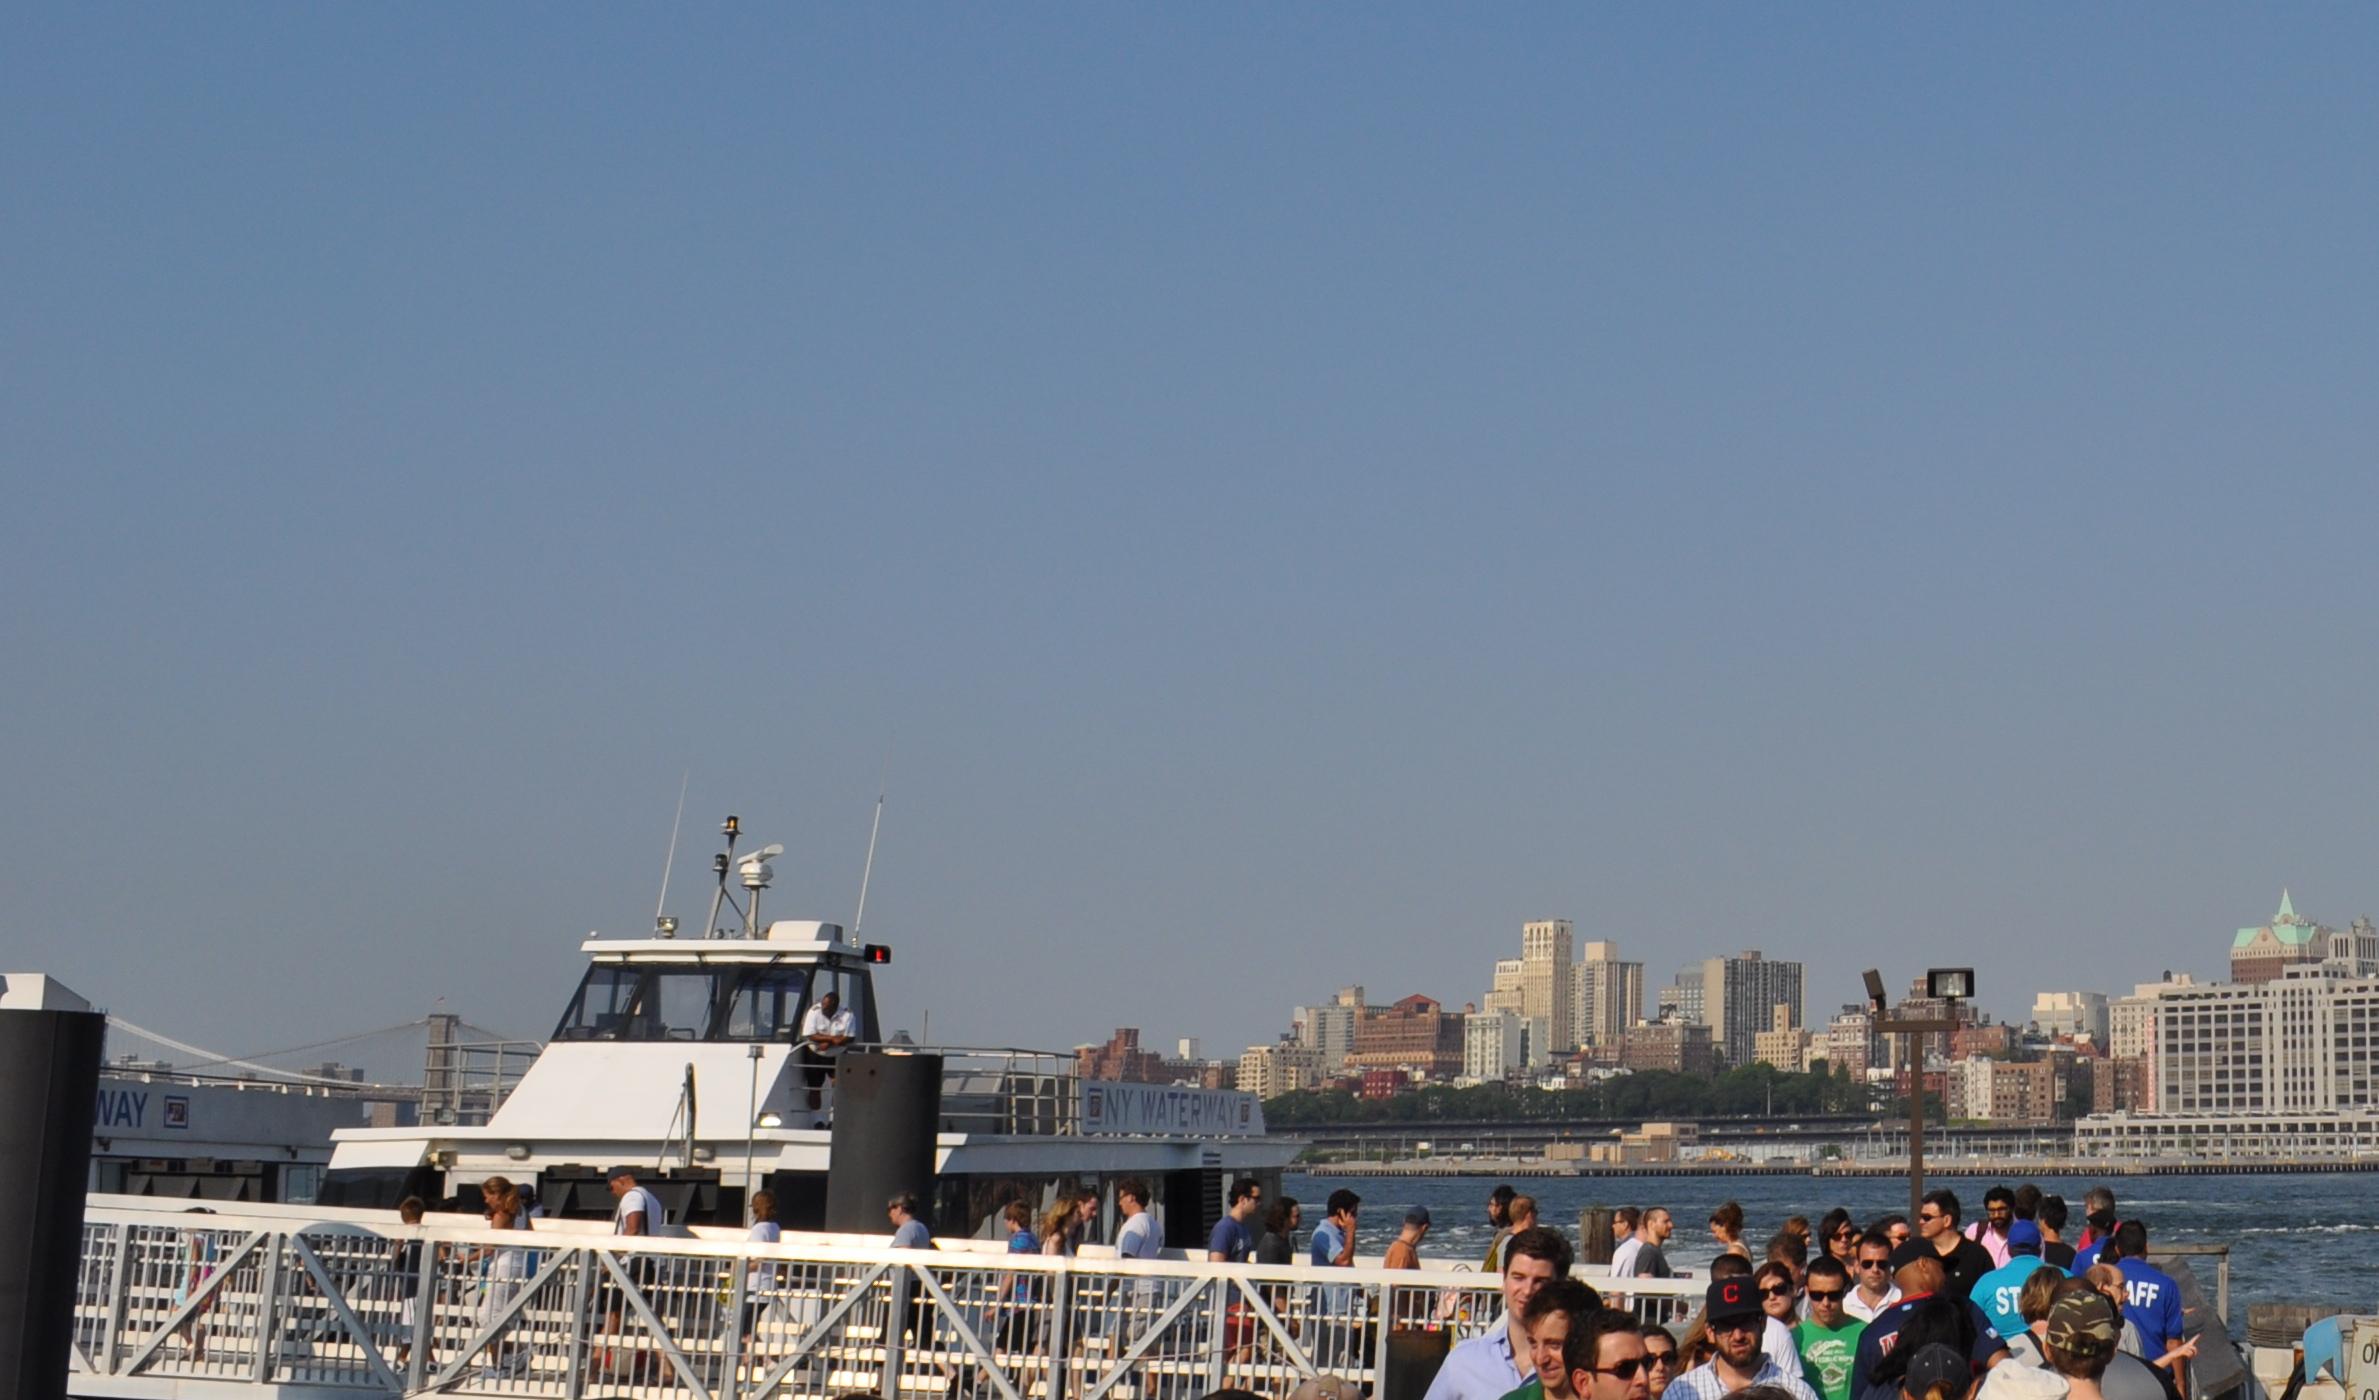 file:governors island - brooklyn bridge park ferry - wikimedia